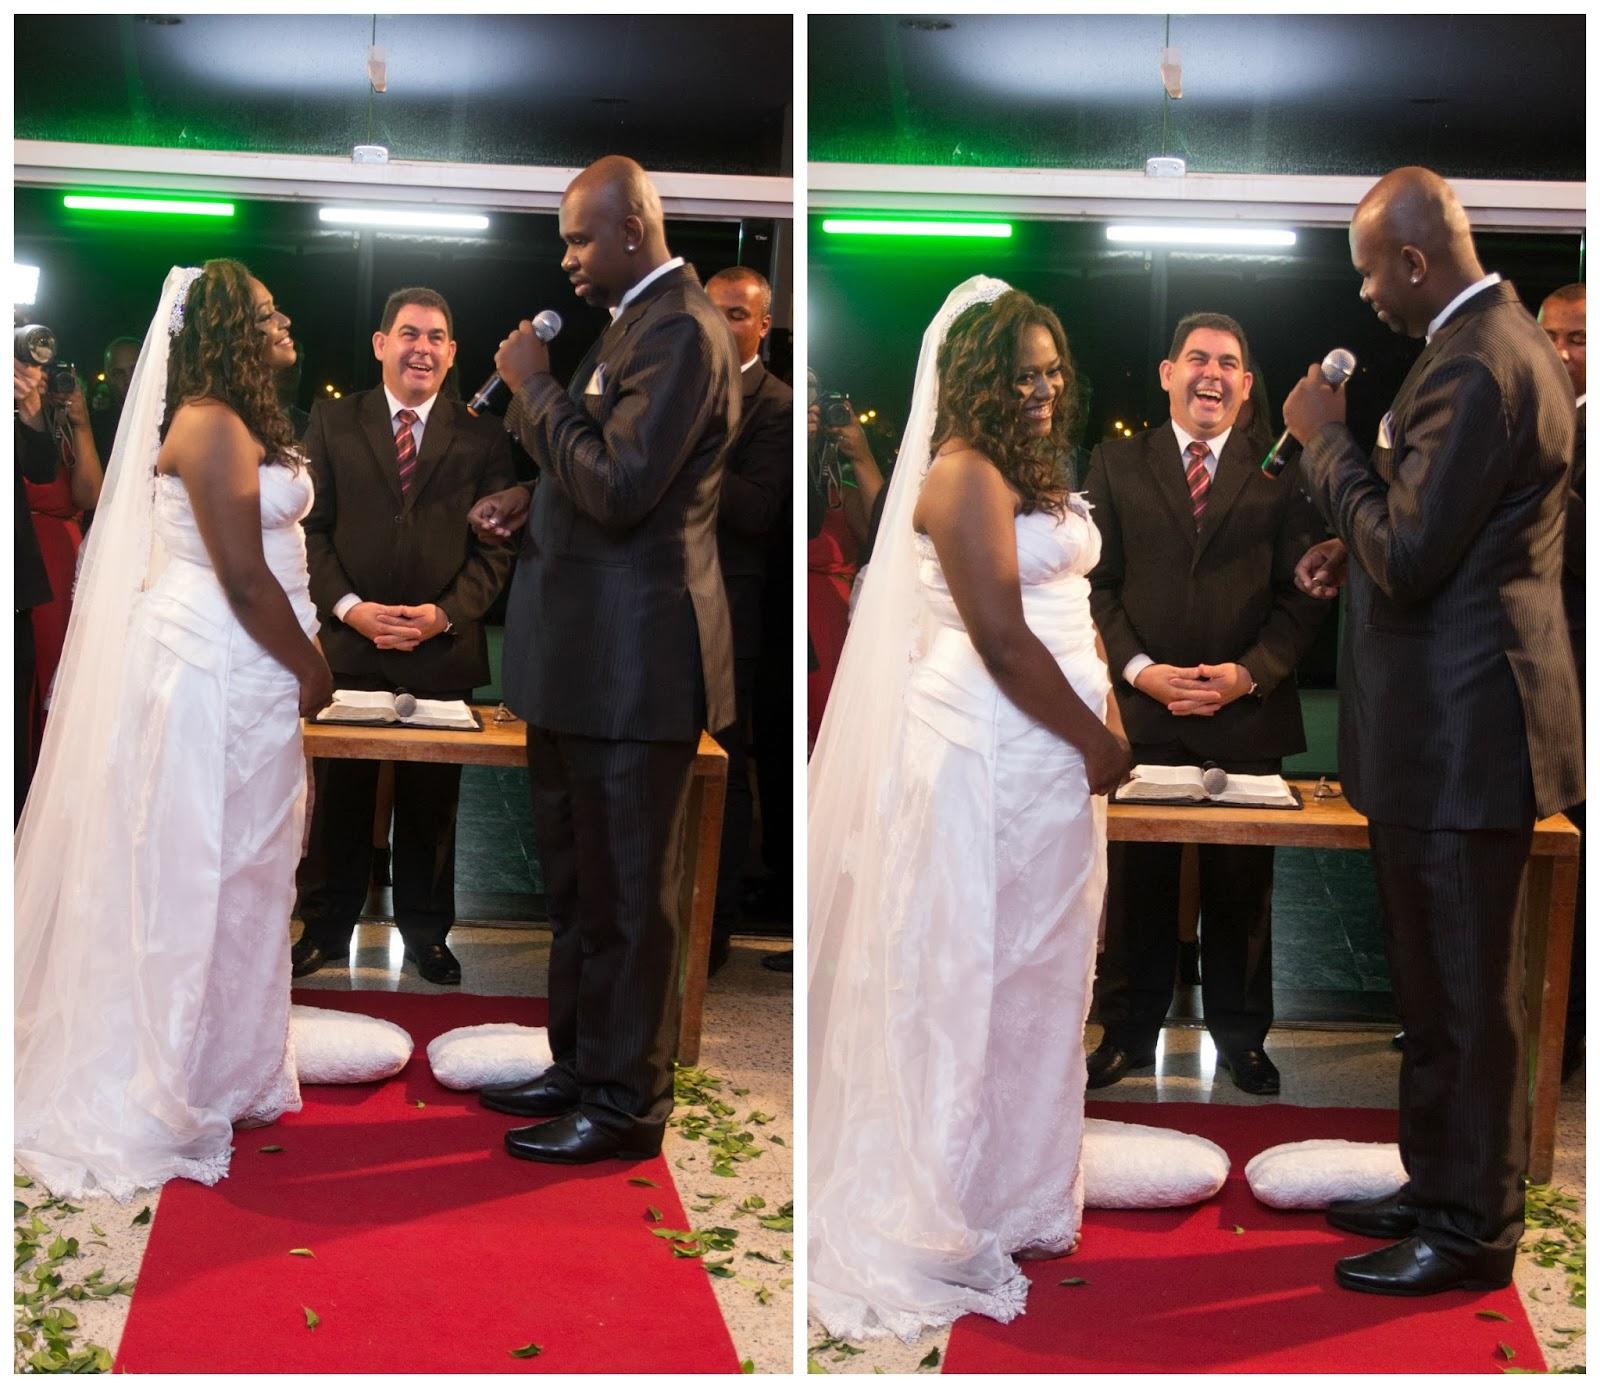 historia-amor-fe-cerimonia-noivos-votos